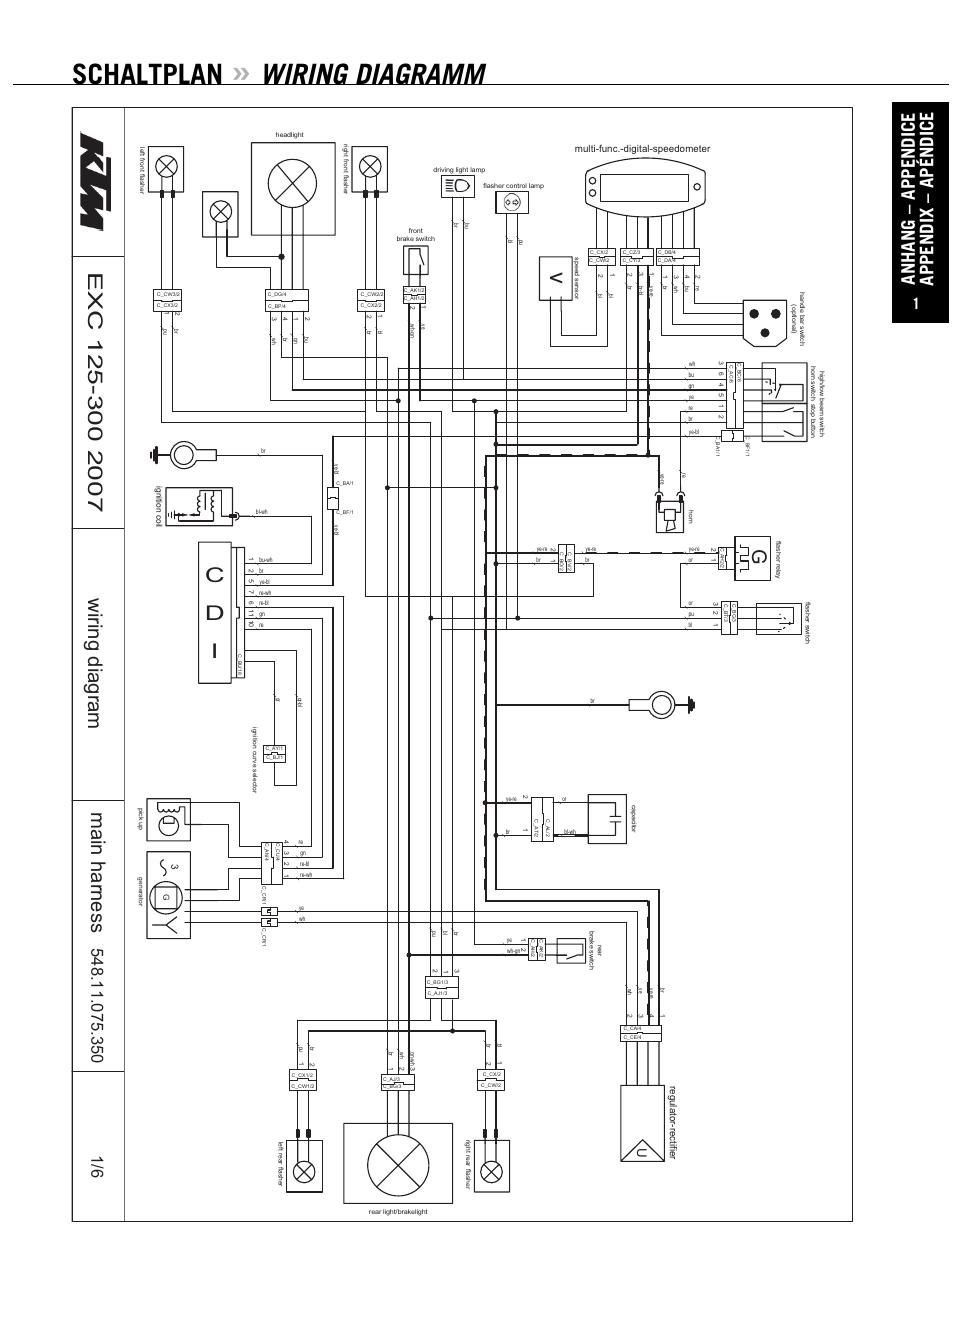 hight resolution of schaltplan wiring diagramm cd i ktm exc 200 xc de user manual page 58 69